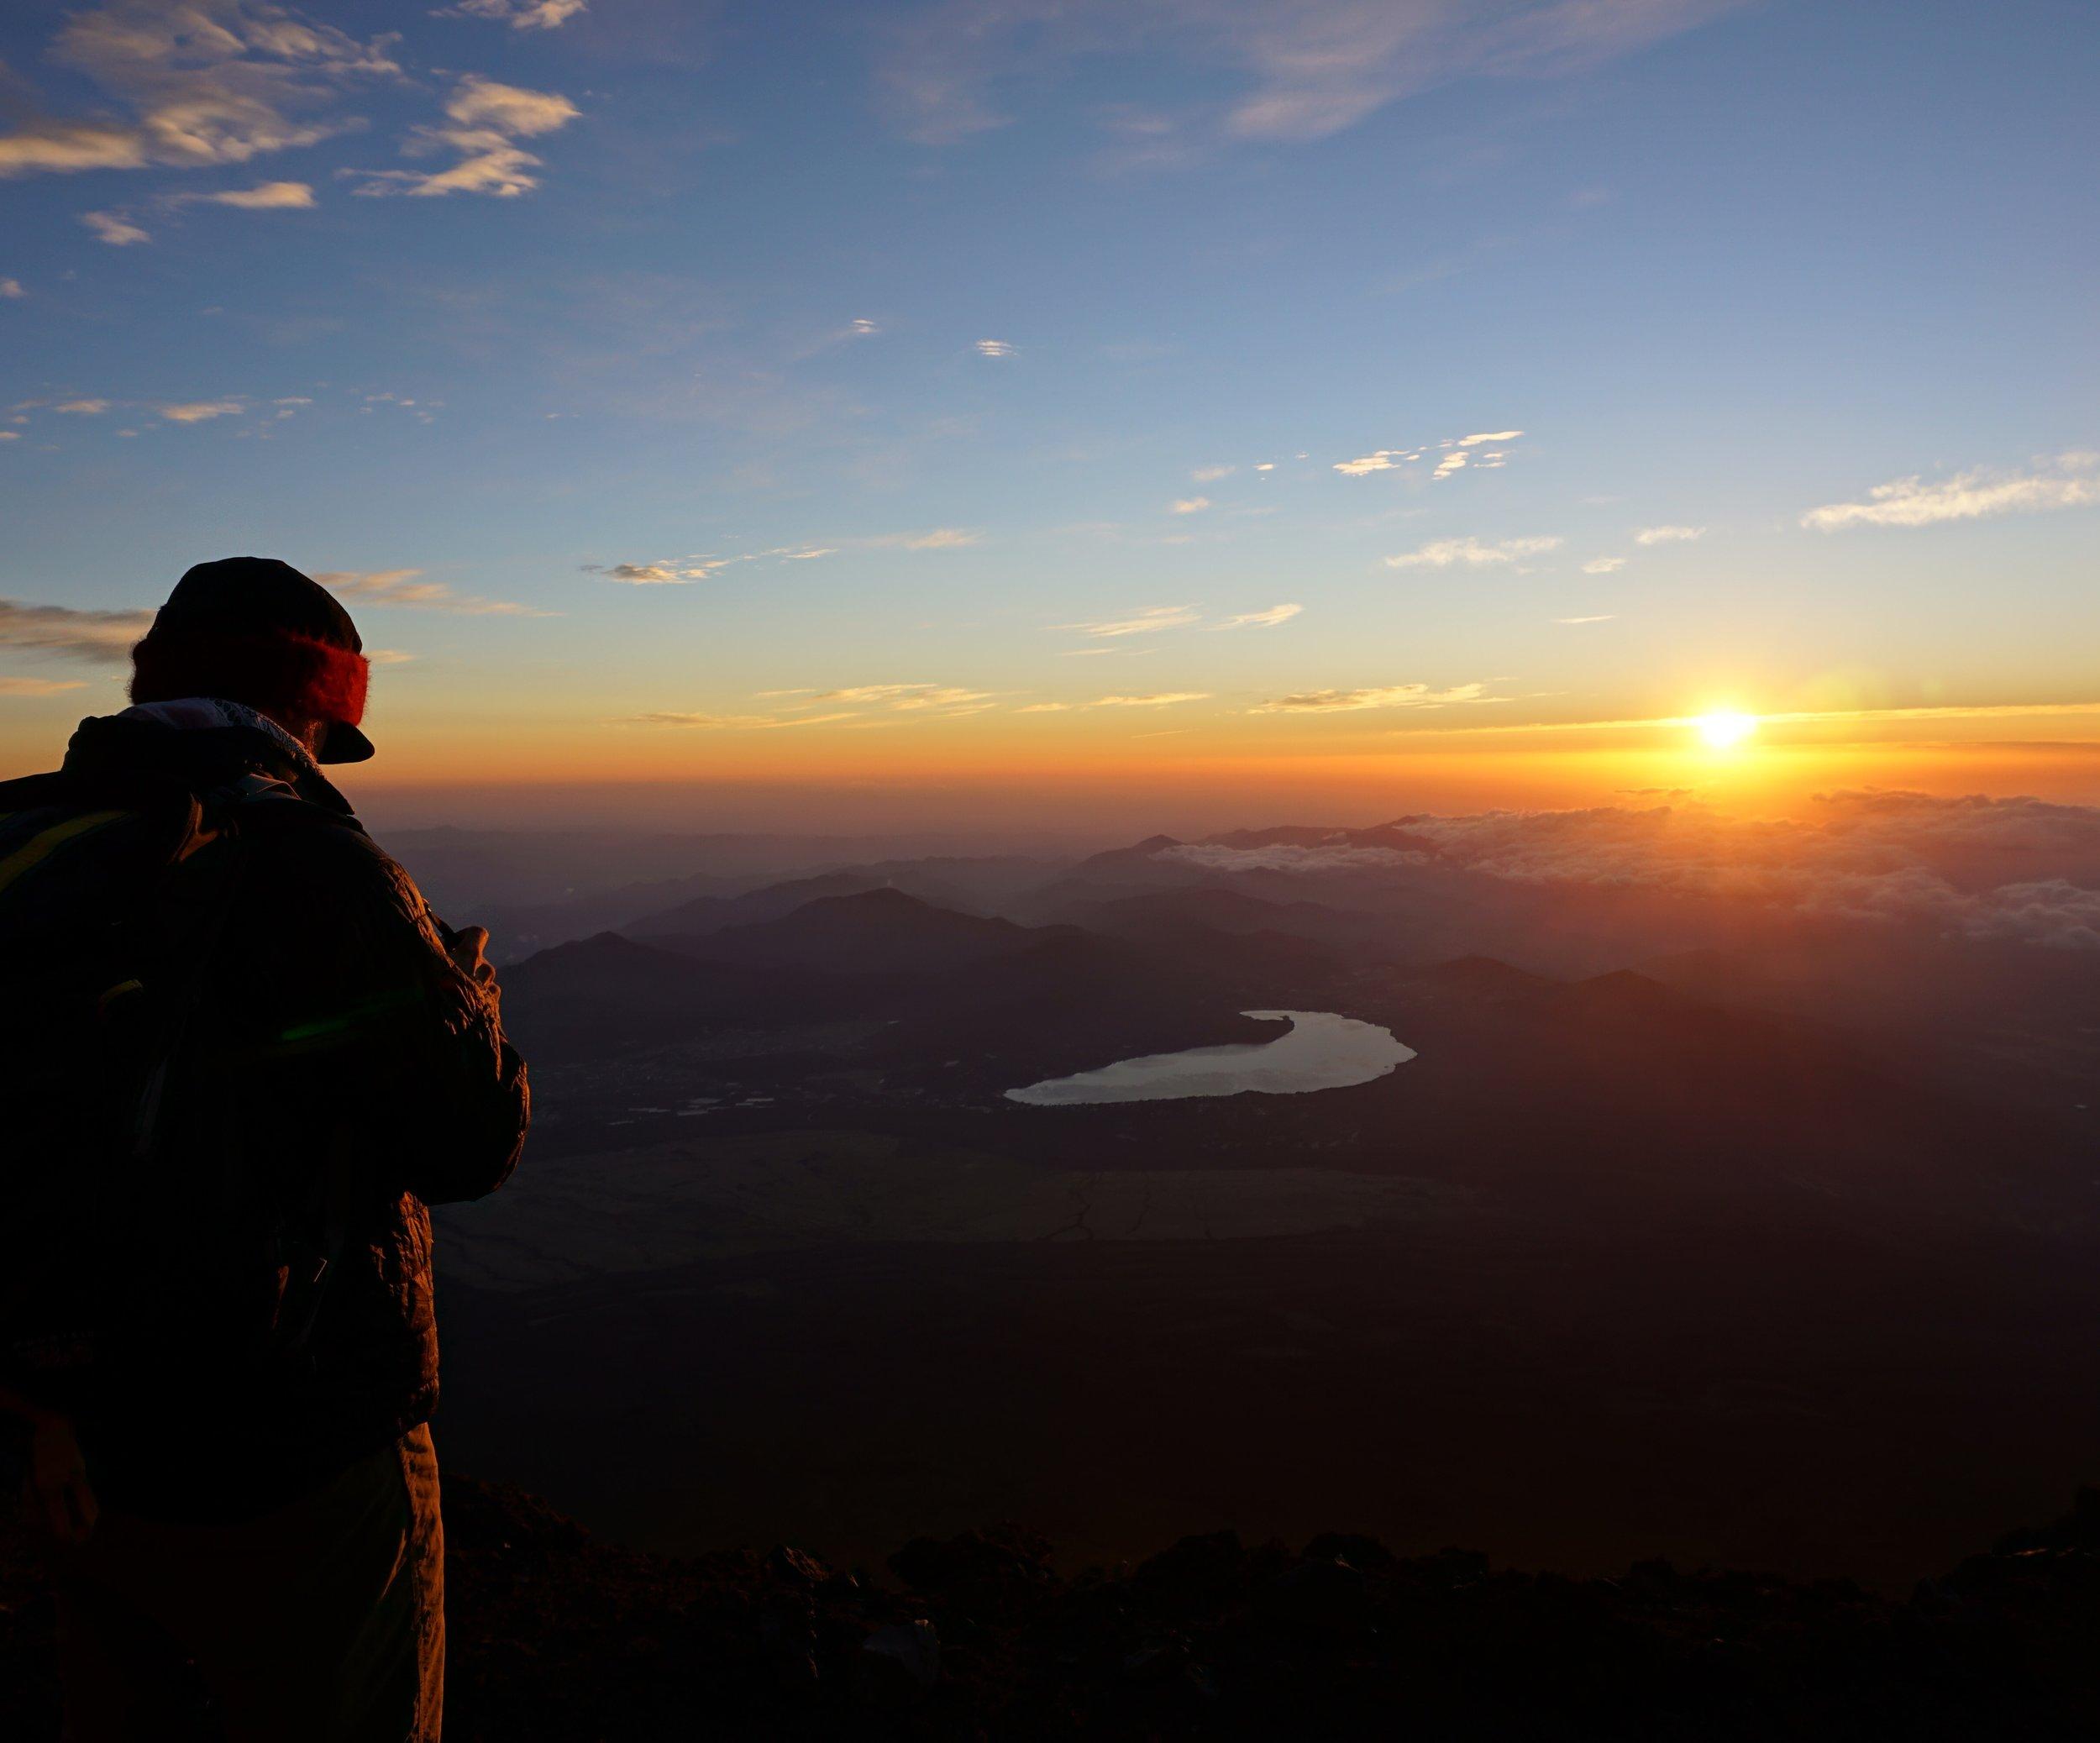 fuji_summit_sunrise